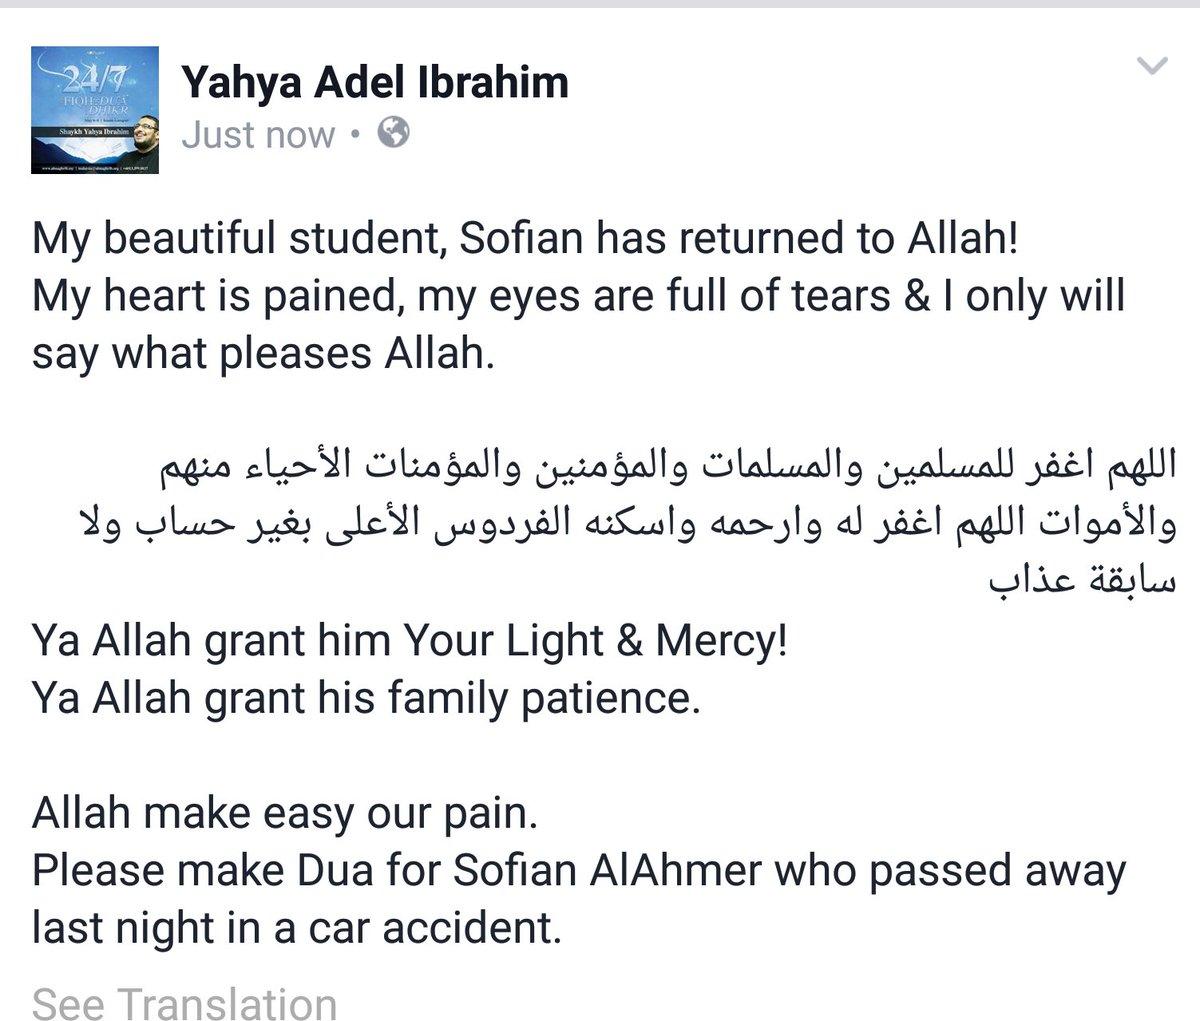 Yahya Adel Ibrahim on Twitter: